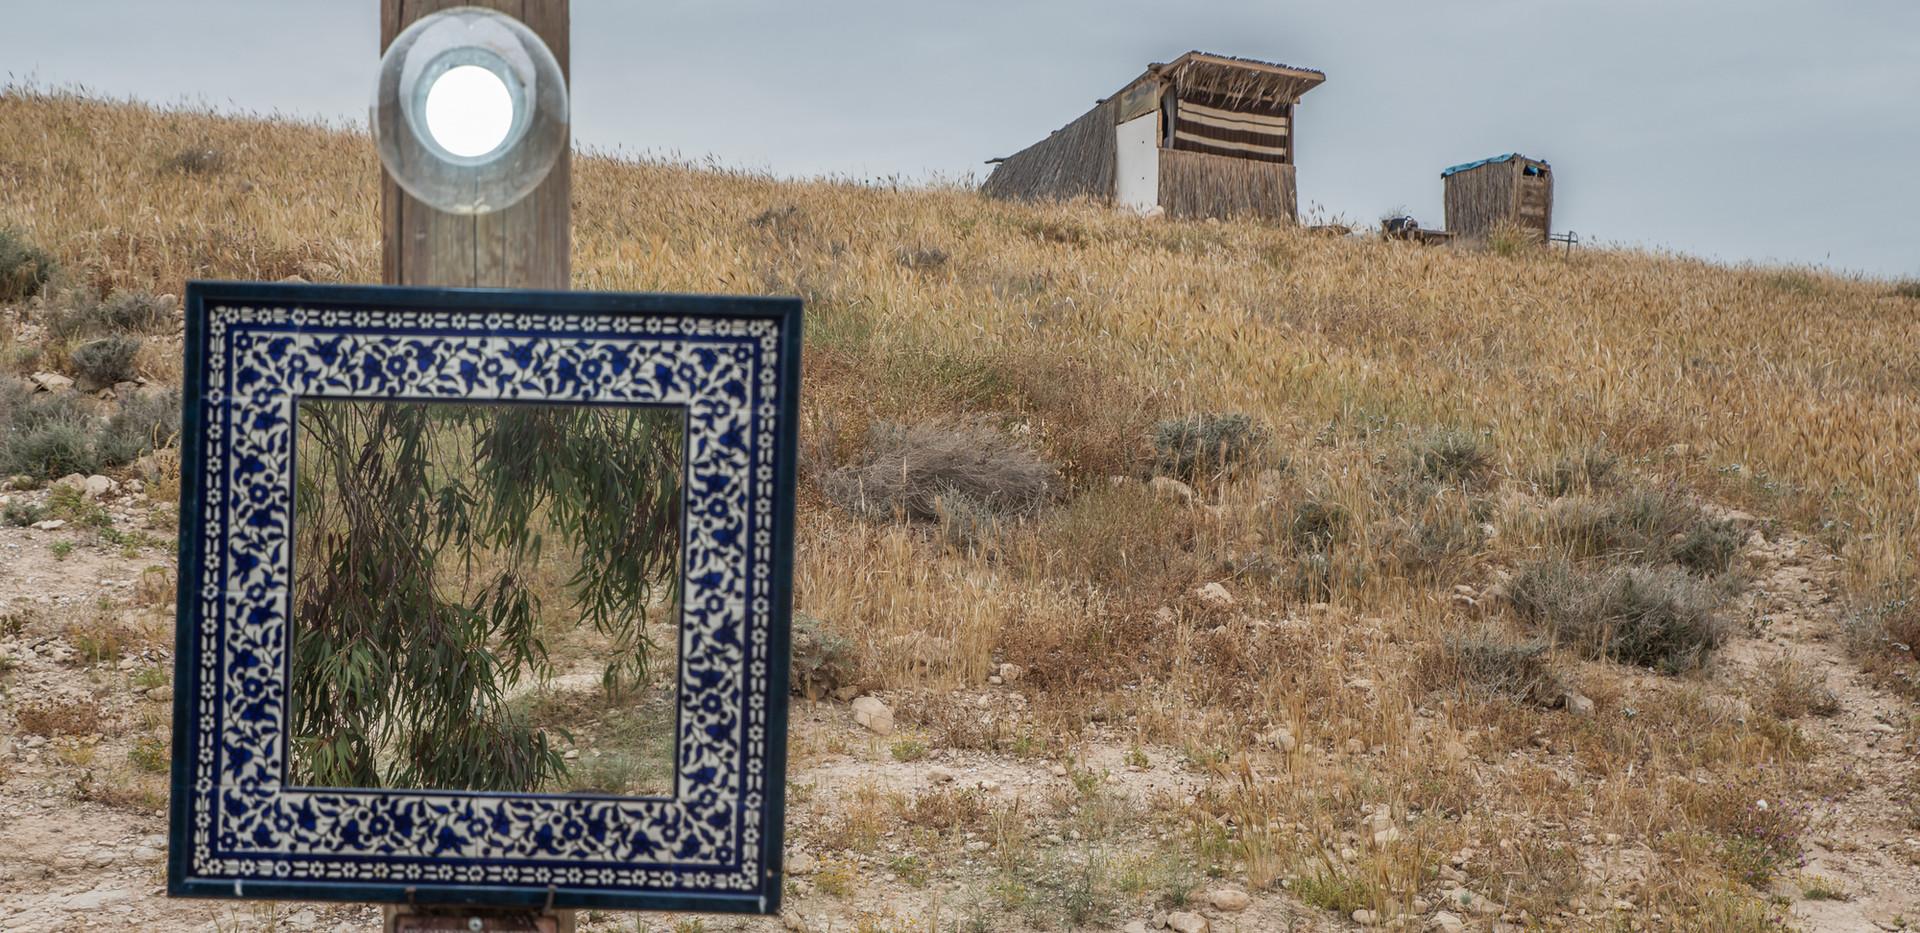 Scenes from Han Eretz ha Mirdafim